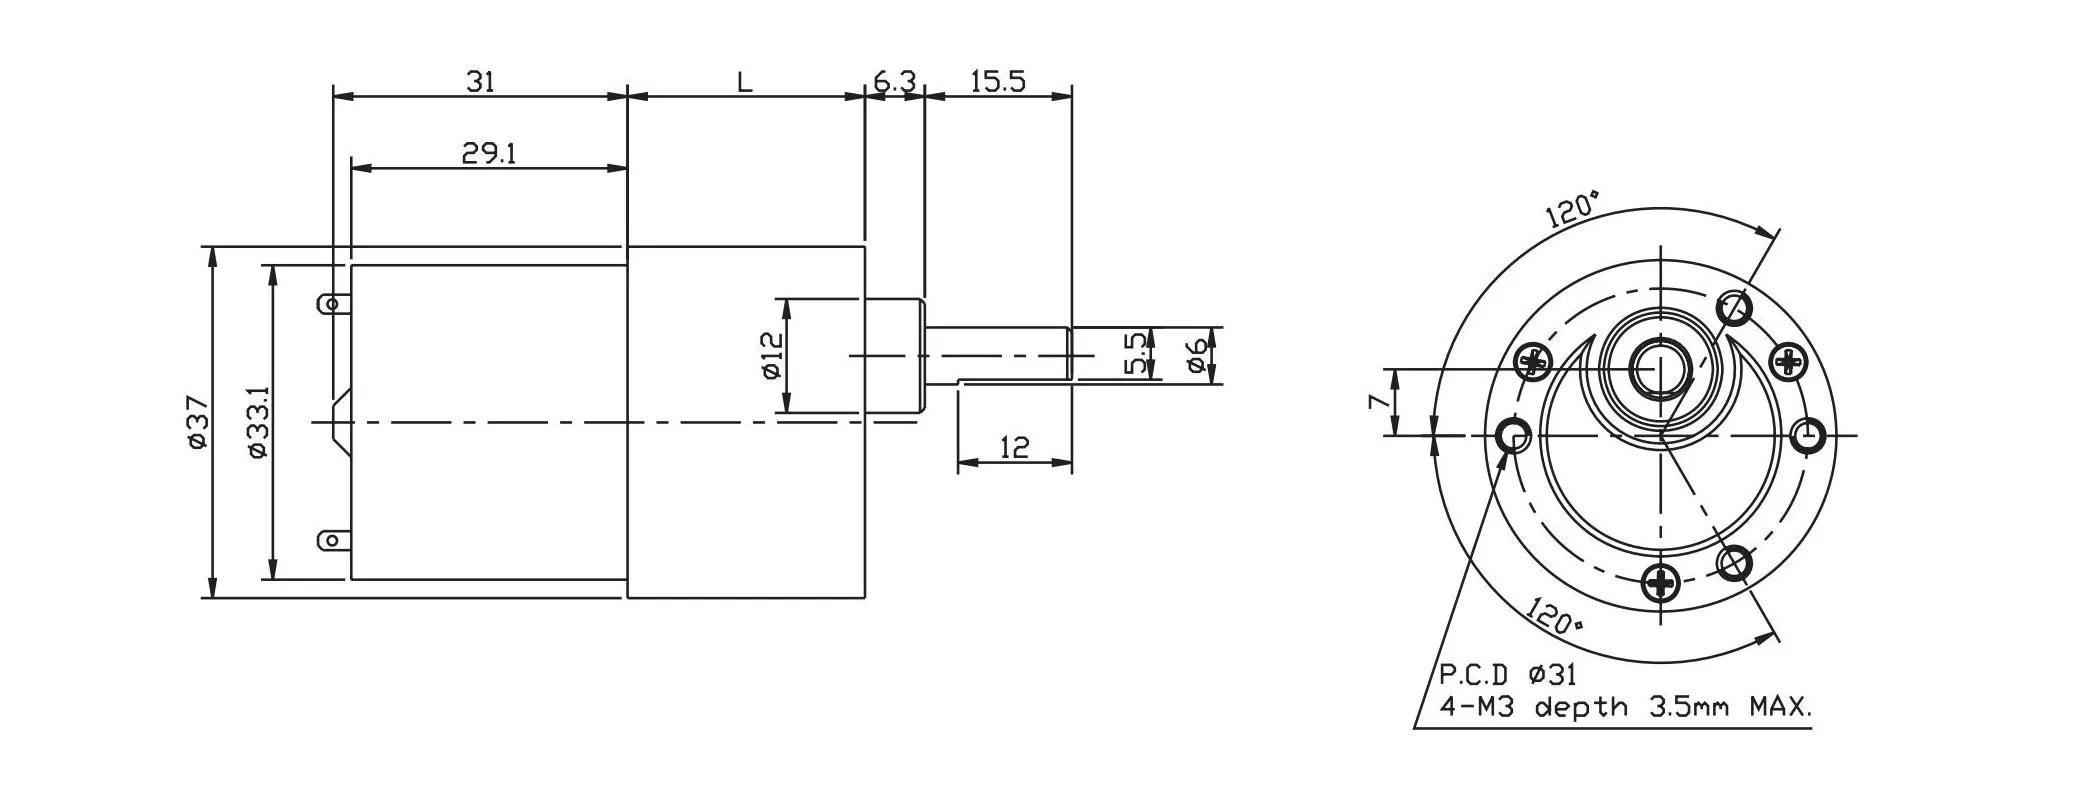 37mm Tg38 Dc Gear Motor 12v Dc Gear Motor 24v Dc Gear